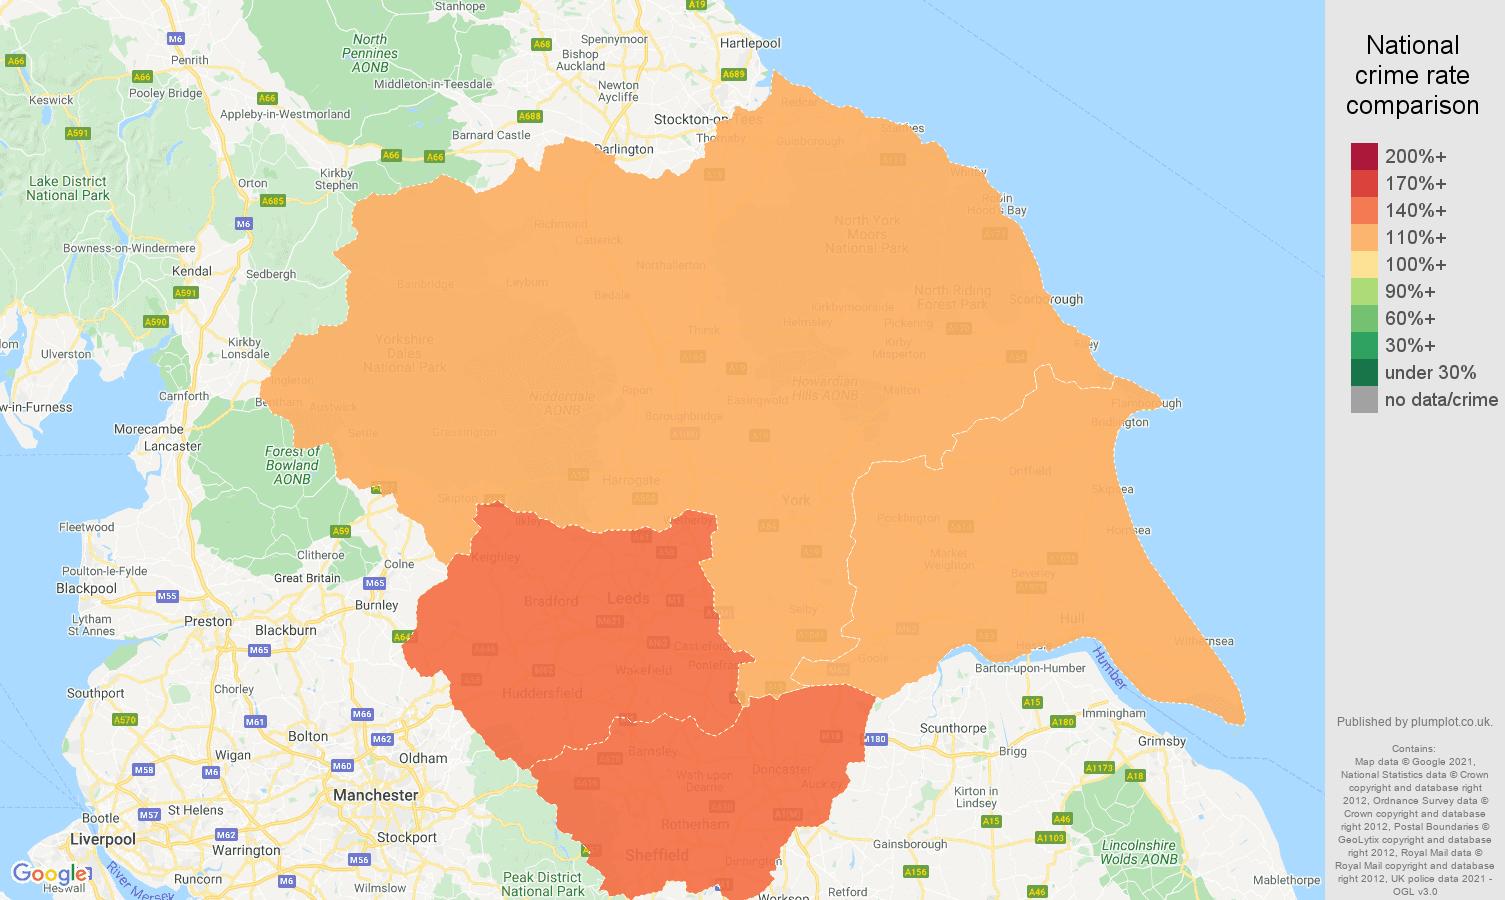 Yorkshire criminal damage and arson crime rate comparison map